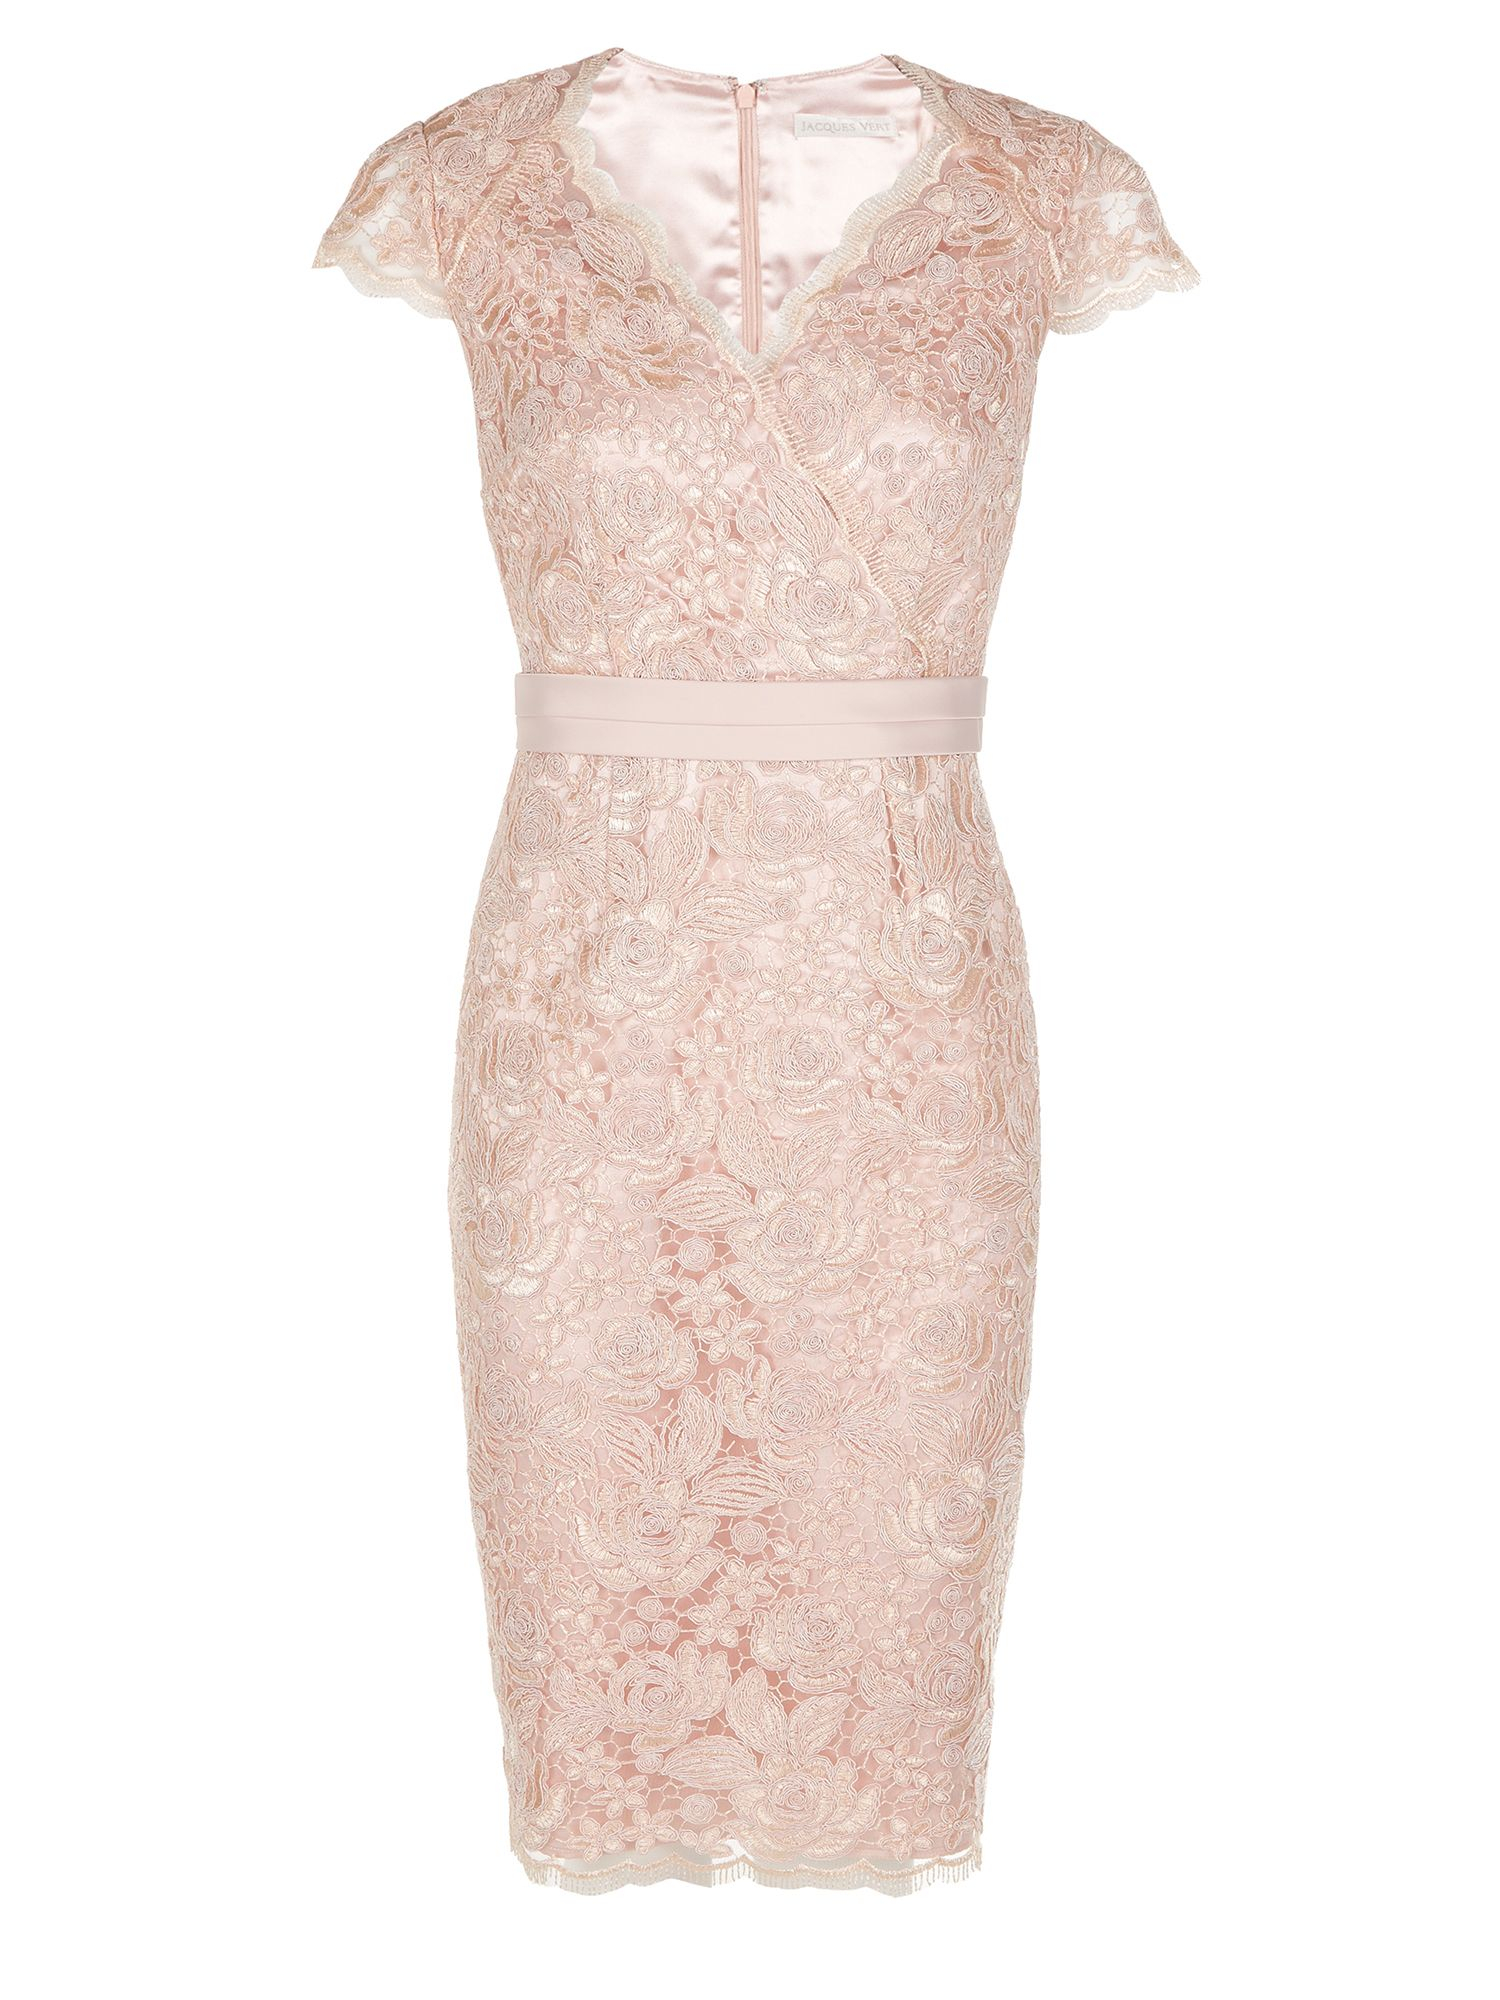 Womens Petite Printed Lace Dress Jacques Vert B4e0rKc6